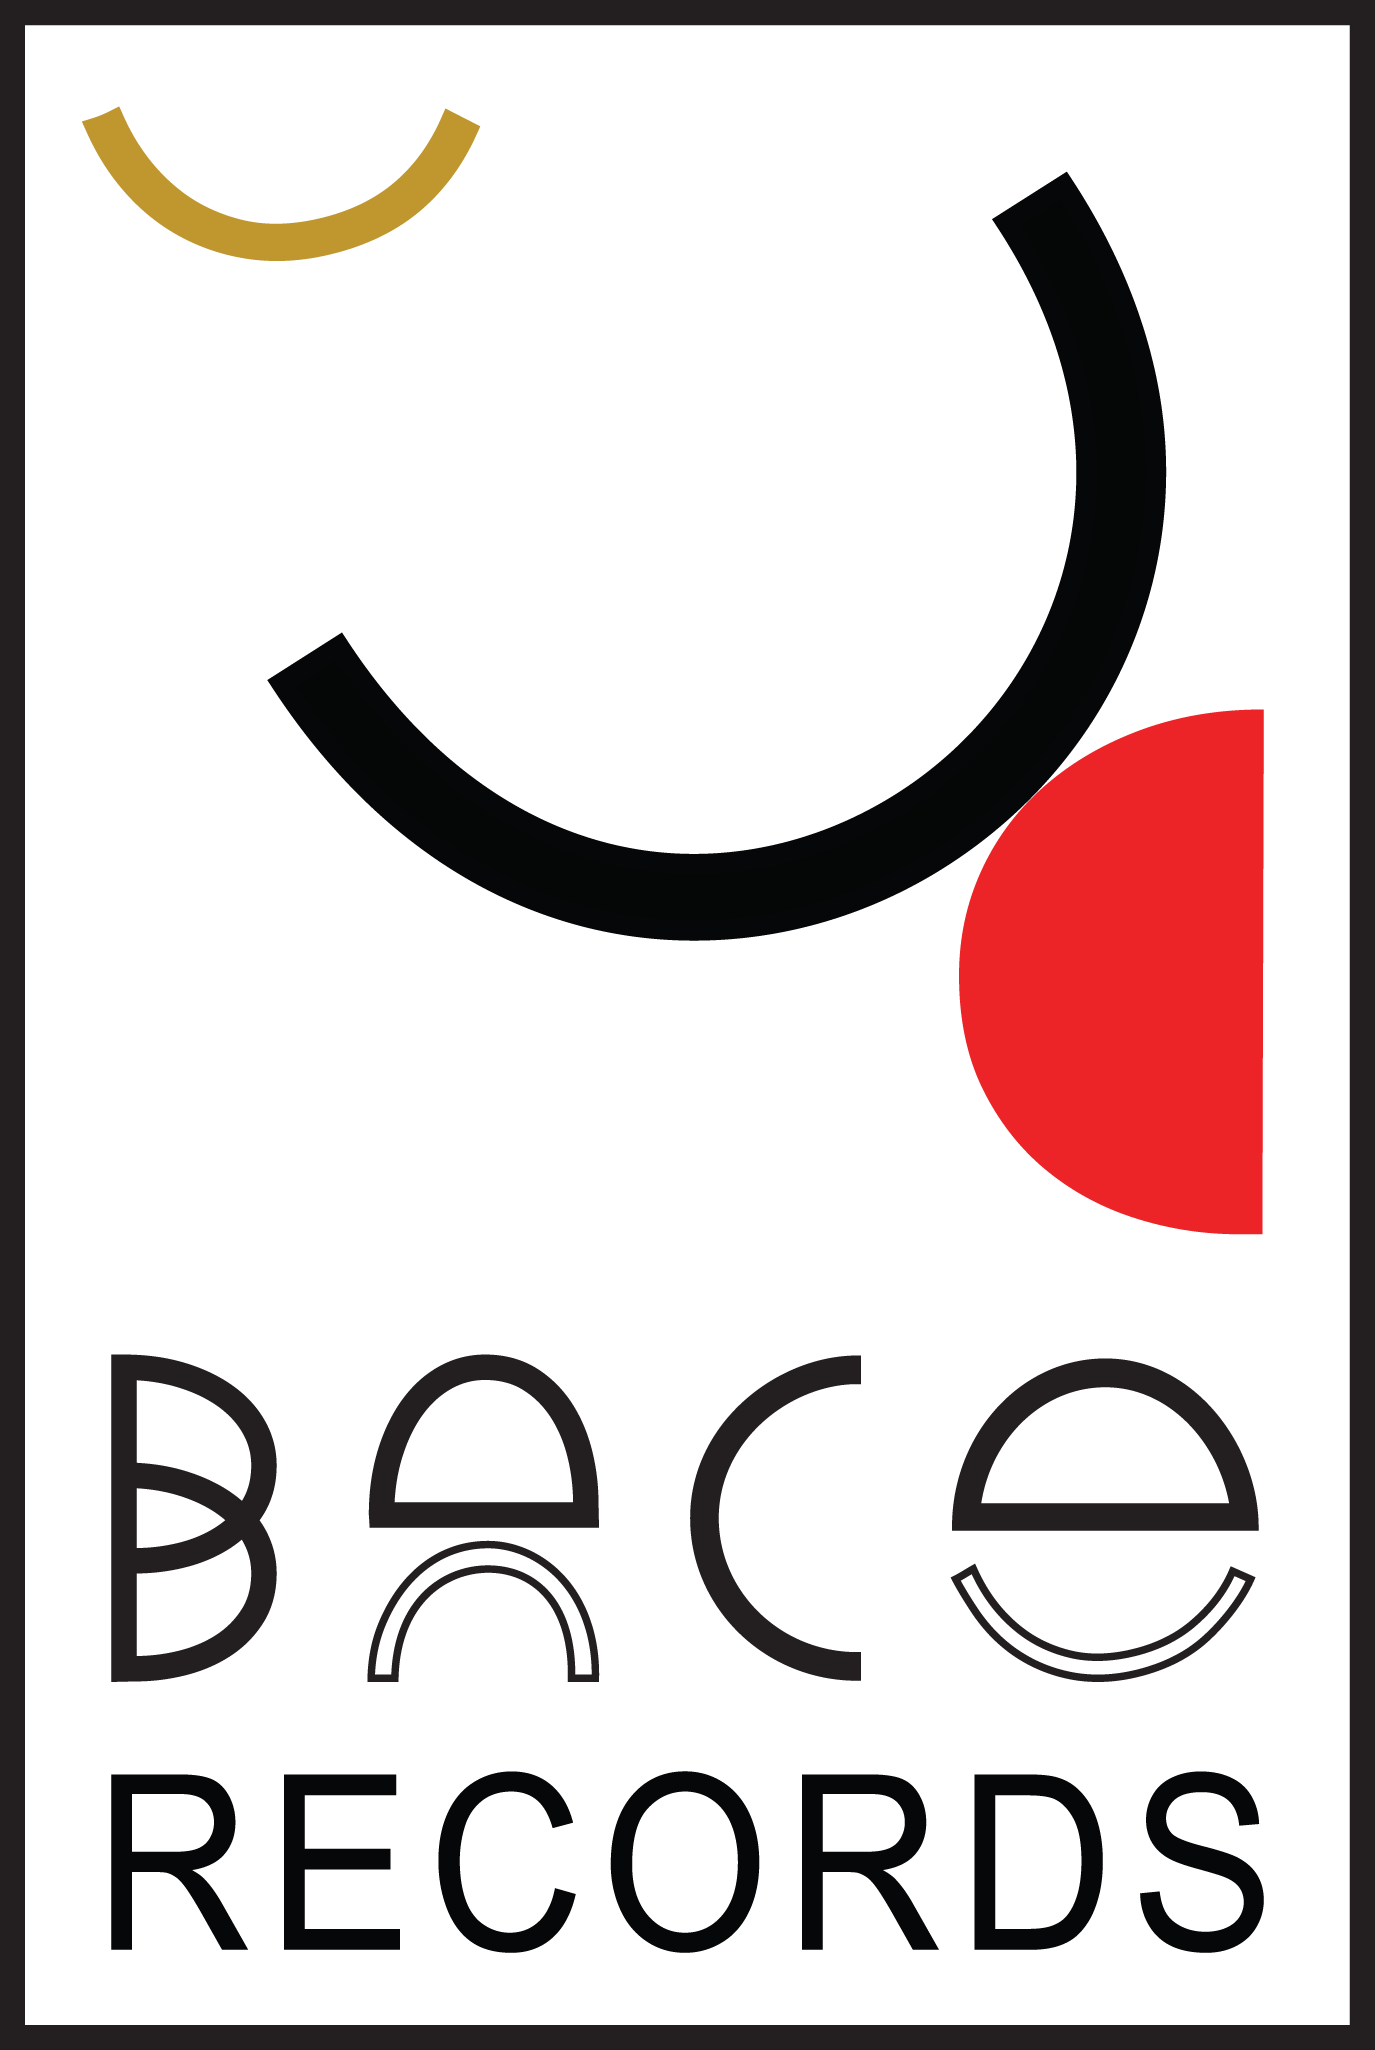 BACE logo-12.png